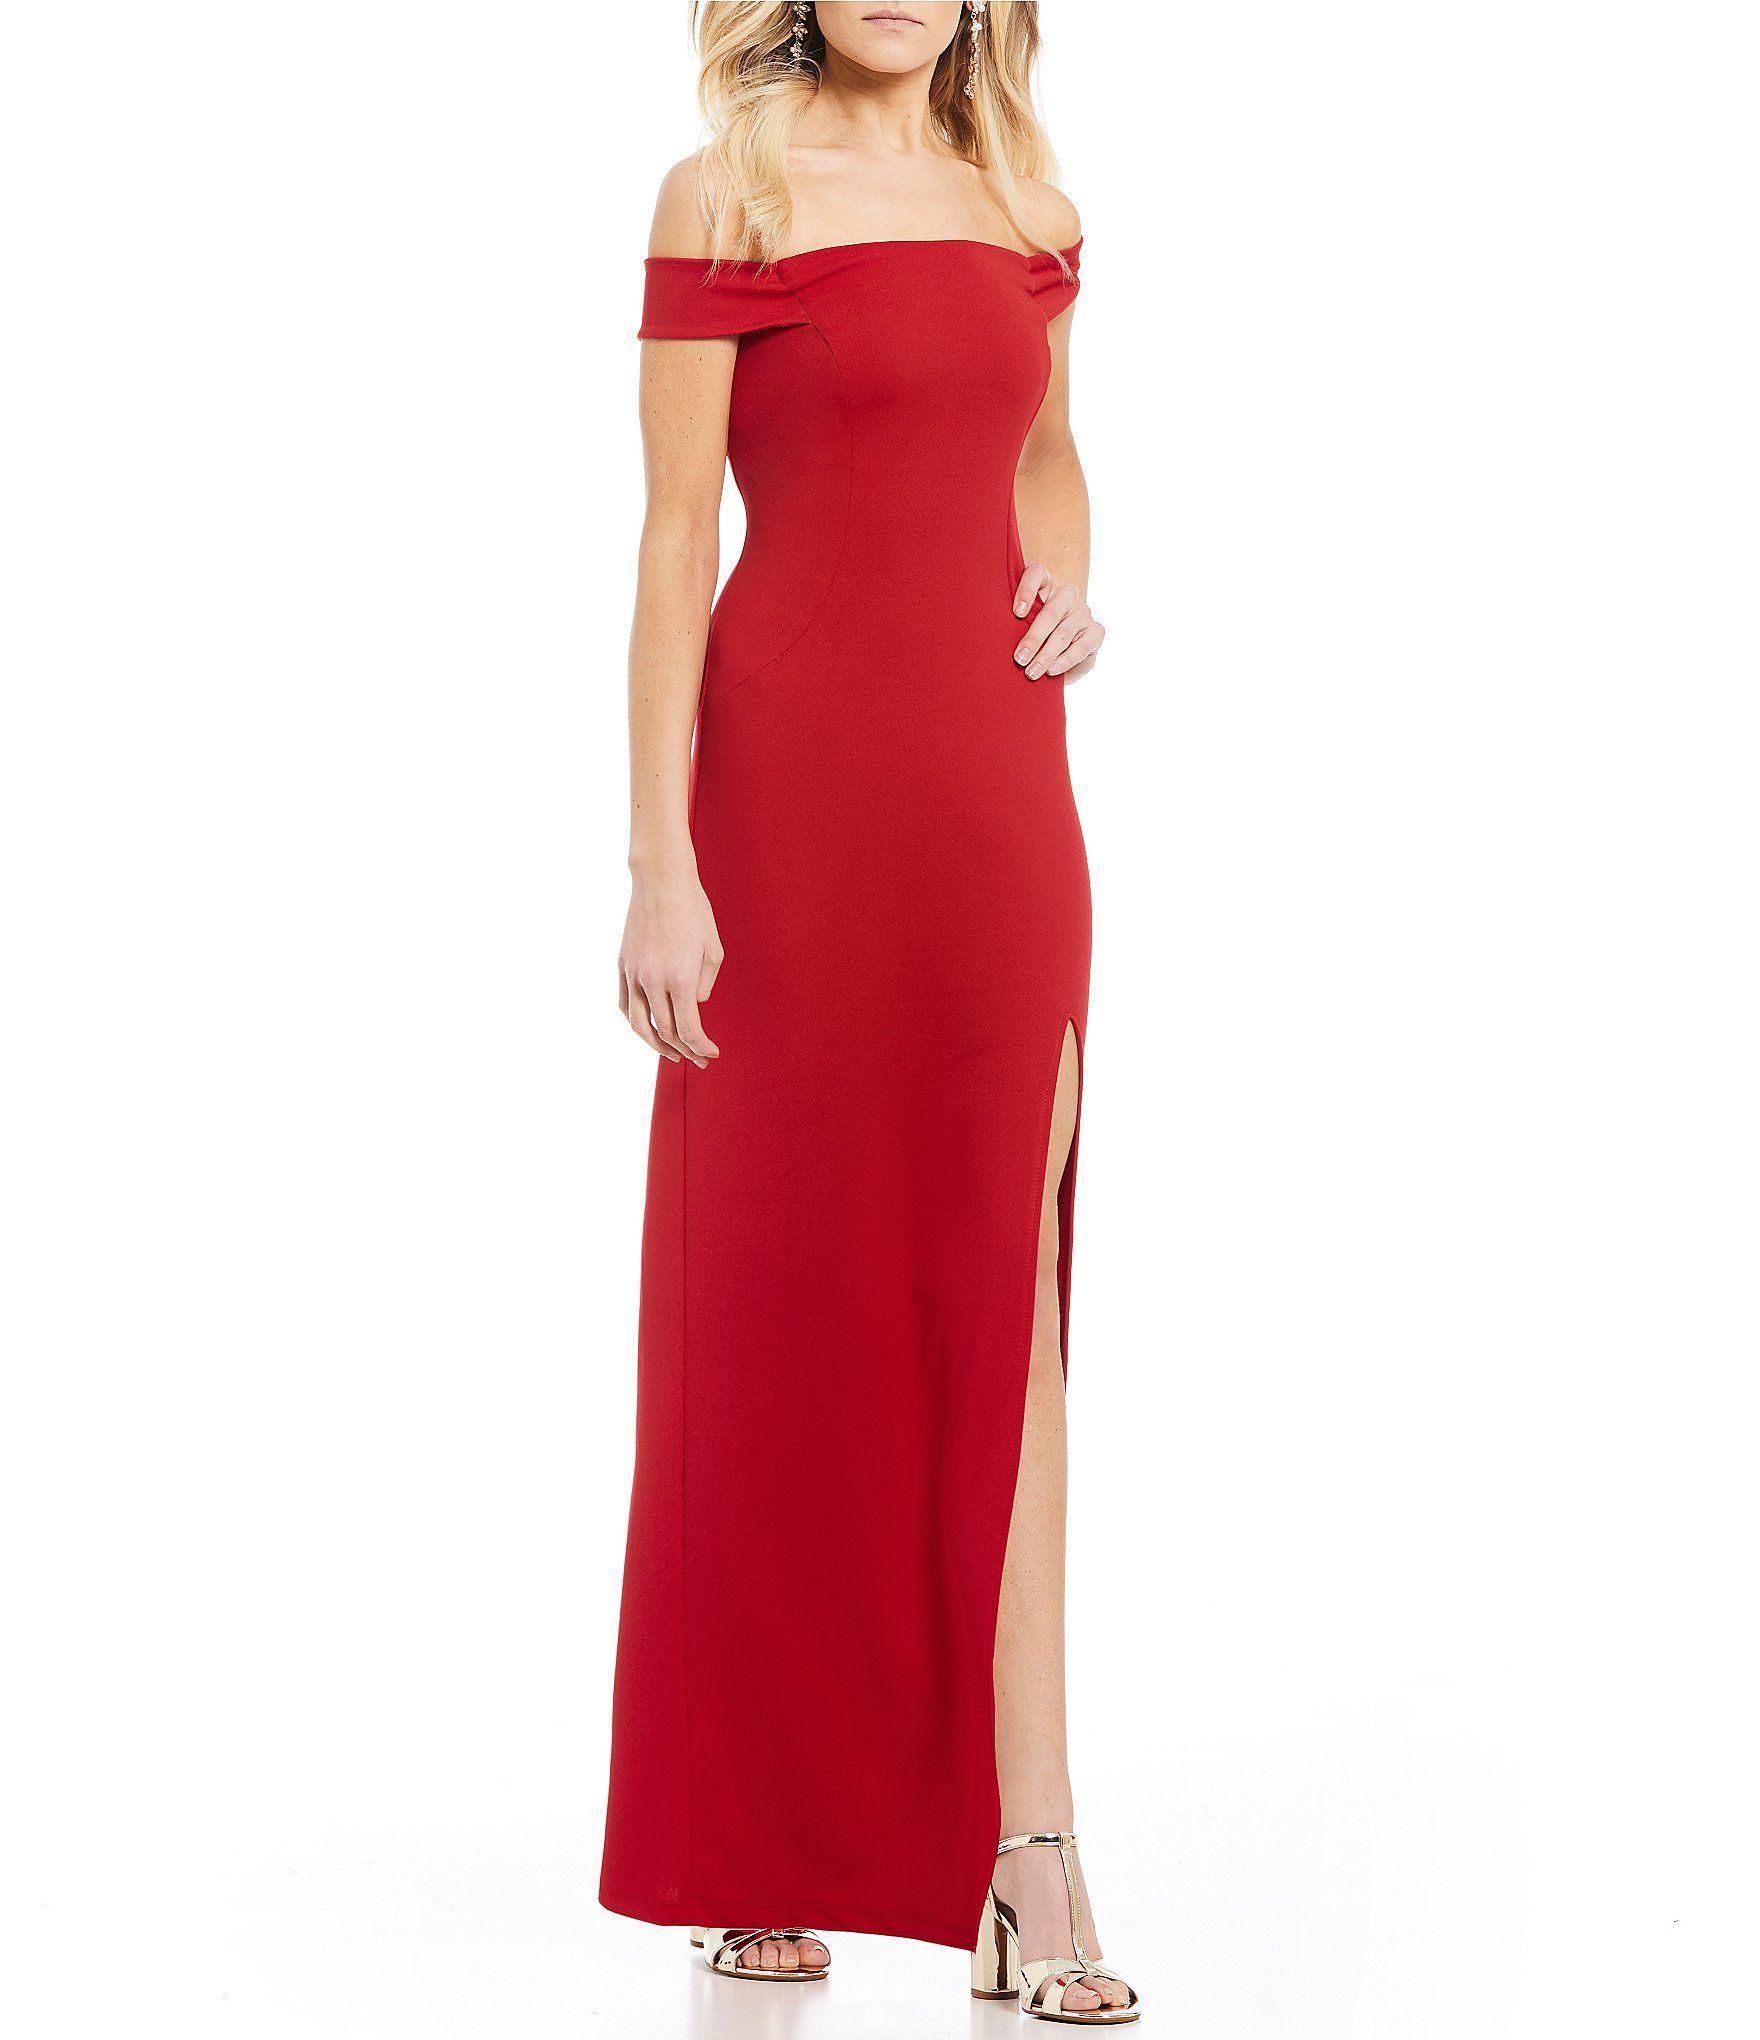 47e83c46536 Shop for Teeze Me Off-The-Shoulder Long Dress at Dillards.com. Visit  Dillards.com to find clothing